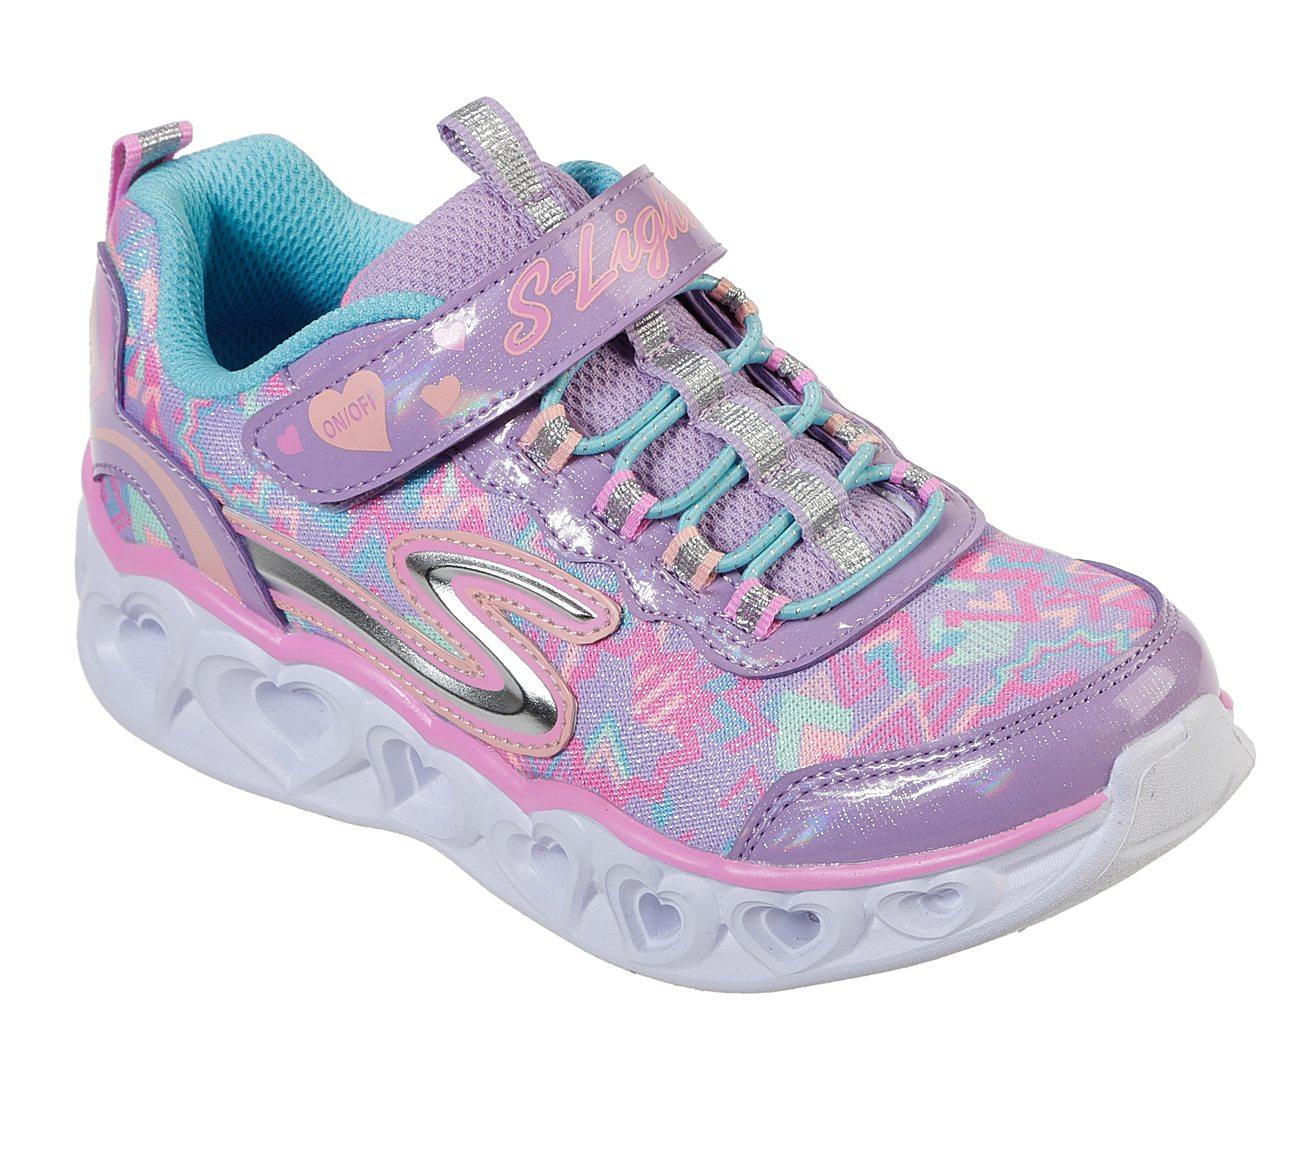 Buy SKECHERS S Lights: Heart Lights S Lights Shoes